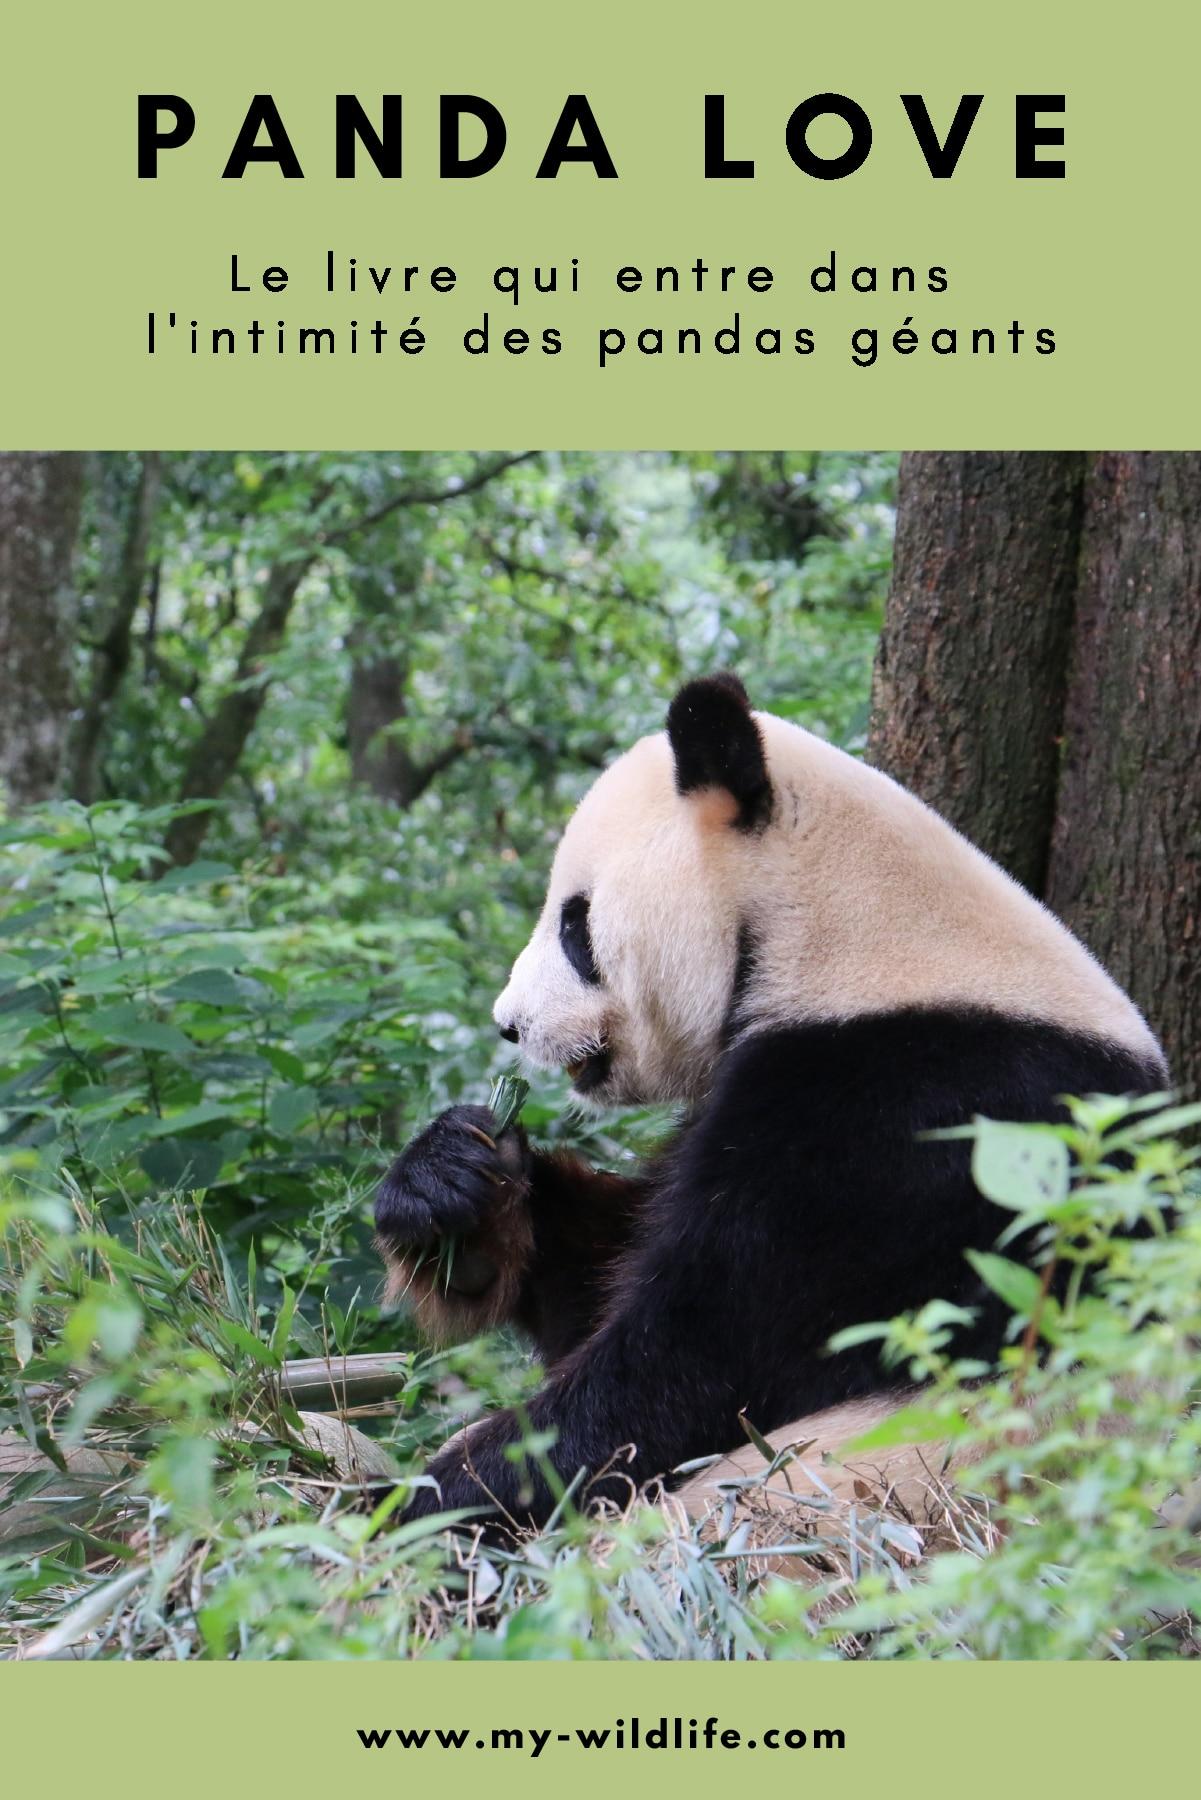 PandaLove-pinterest